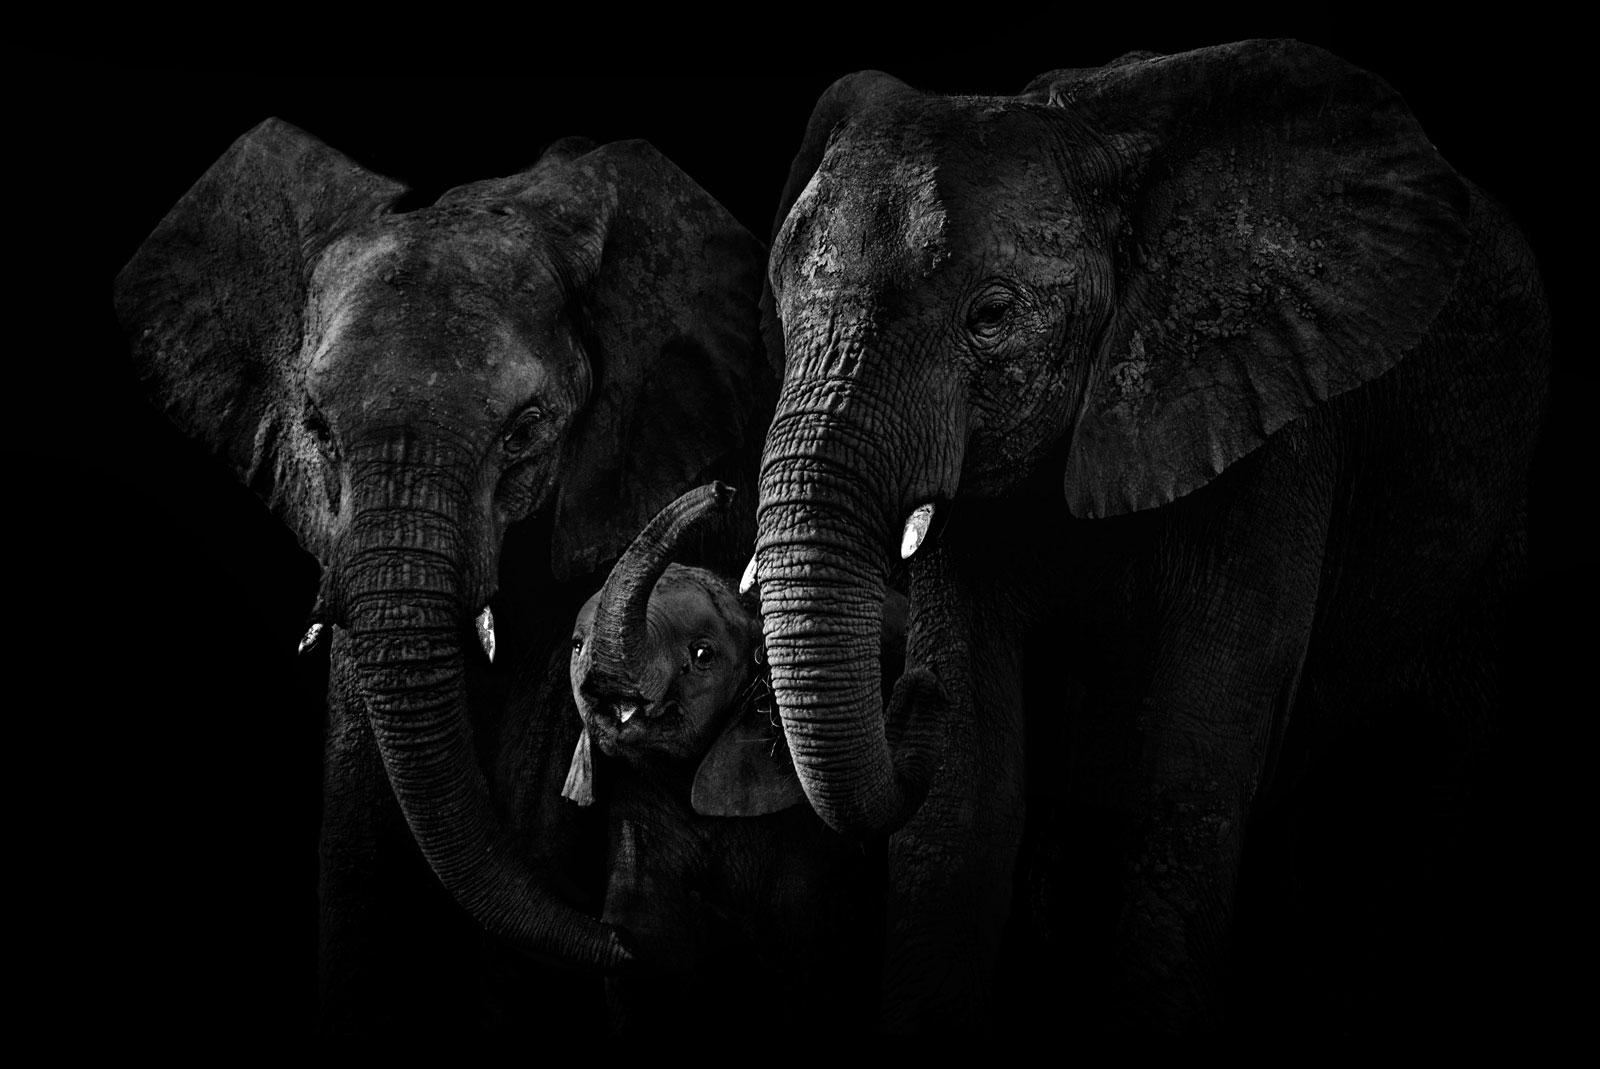 world-elephant-day-Ed-Hetherington